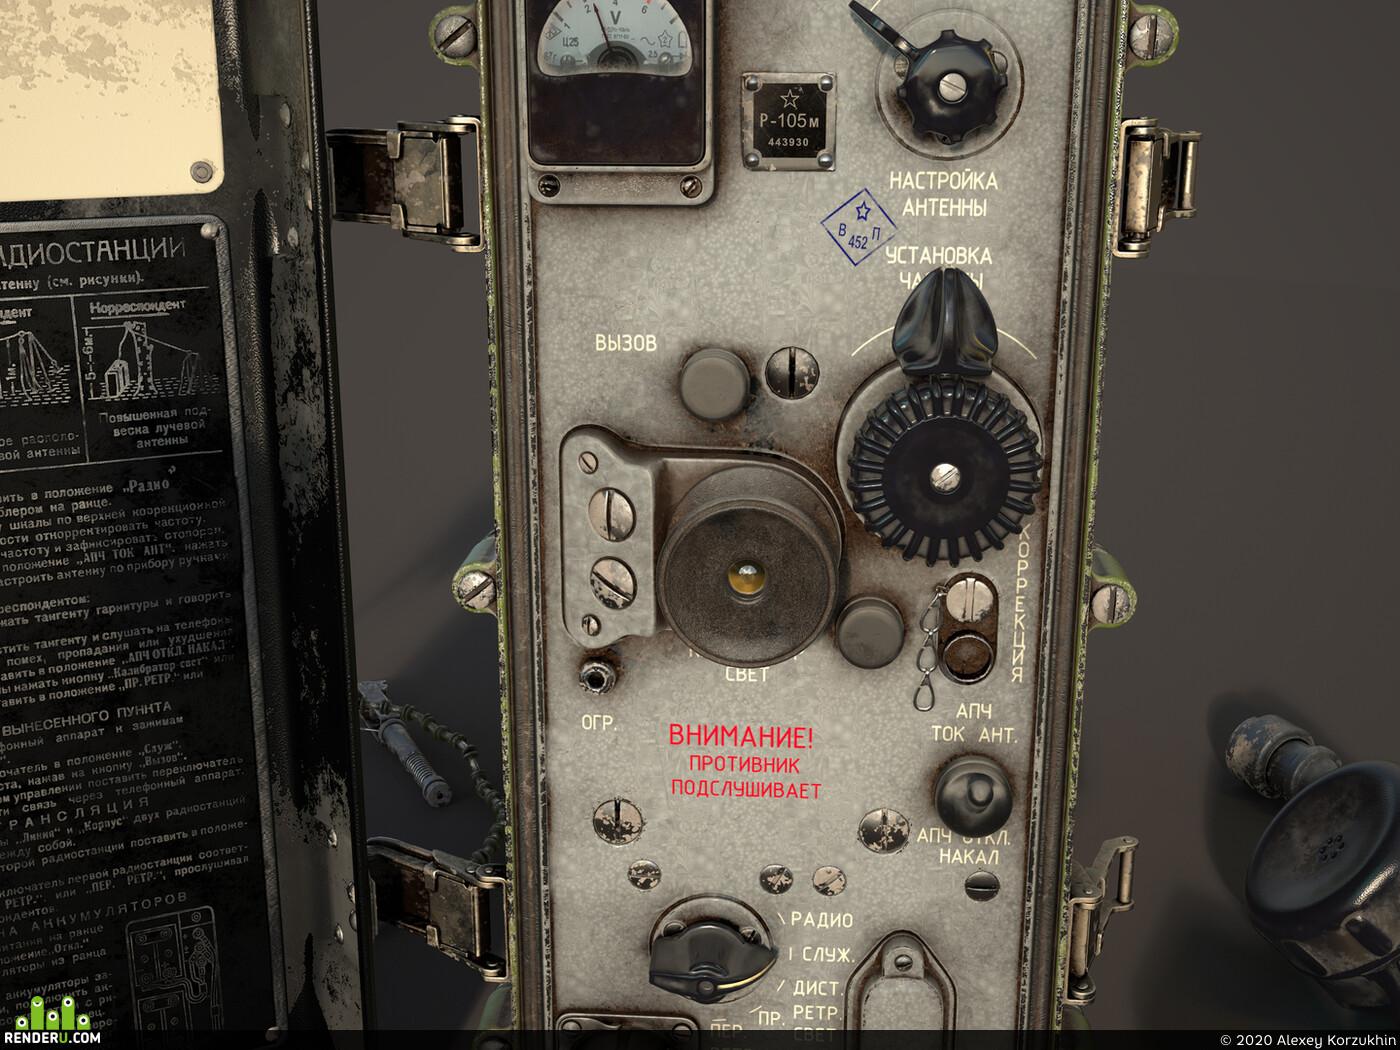 Portable VHF radio, Radio, military, Soviet Union